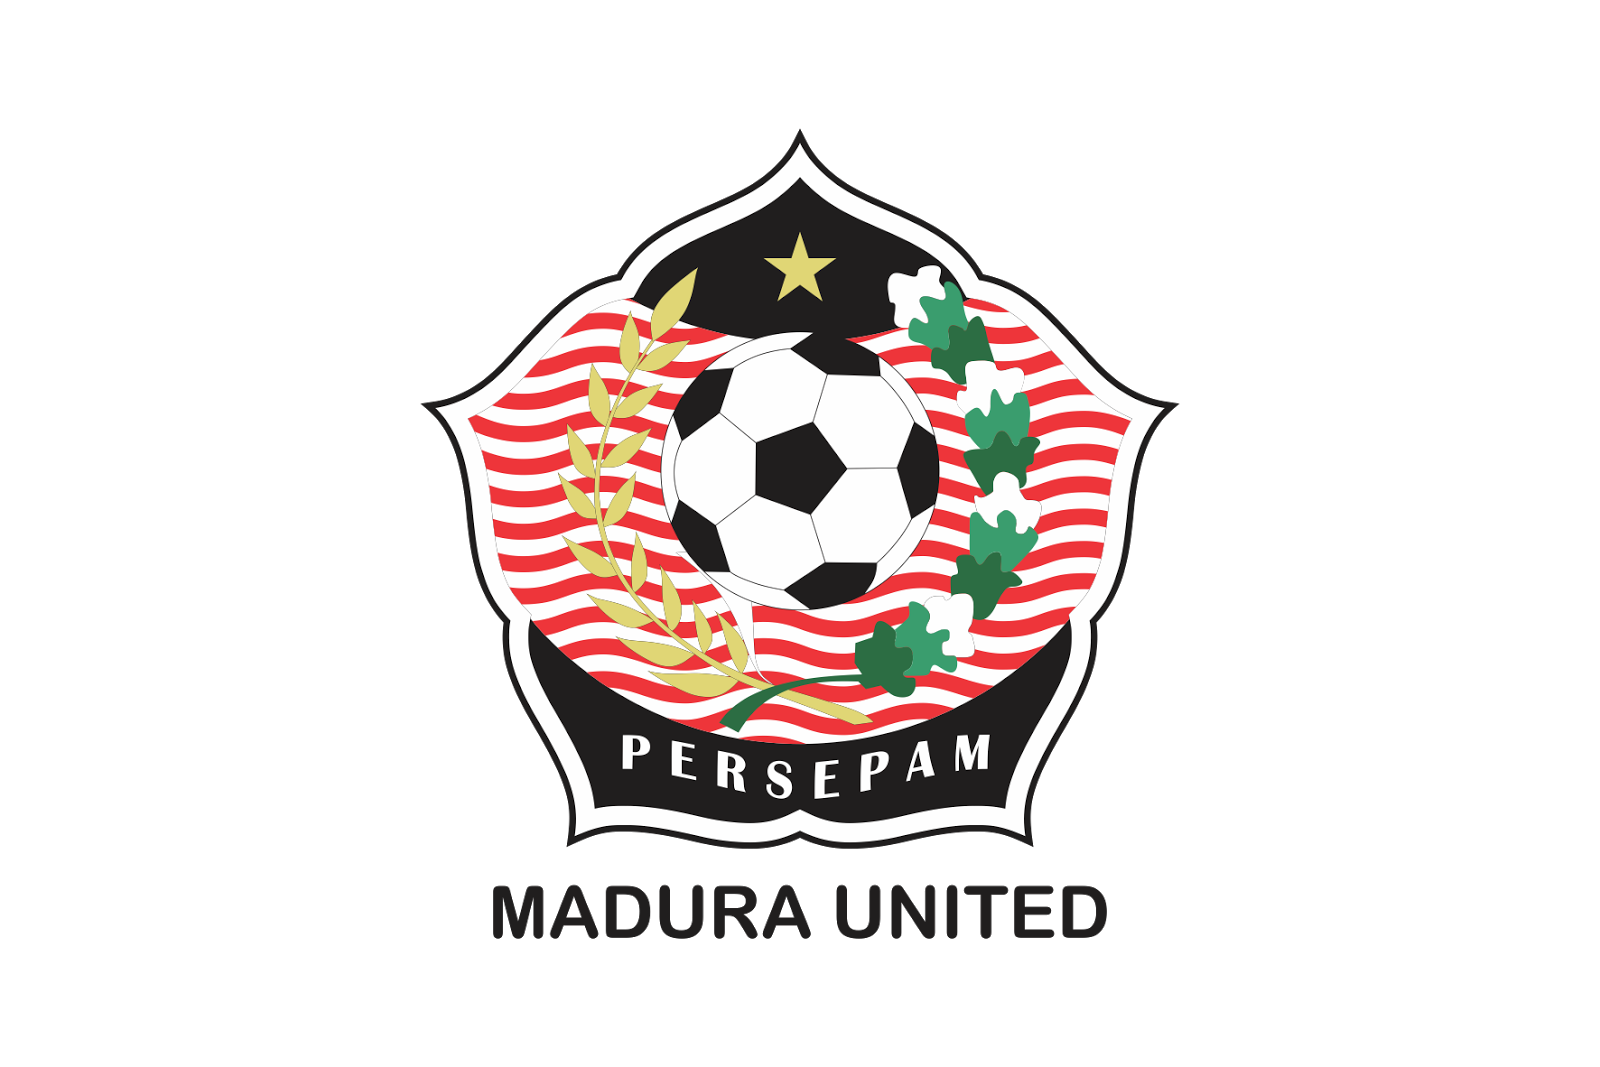 Persepam Madura United Logo